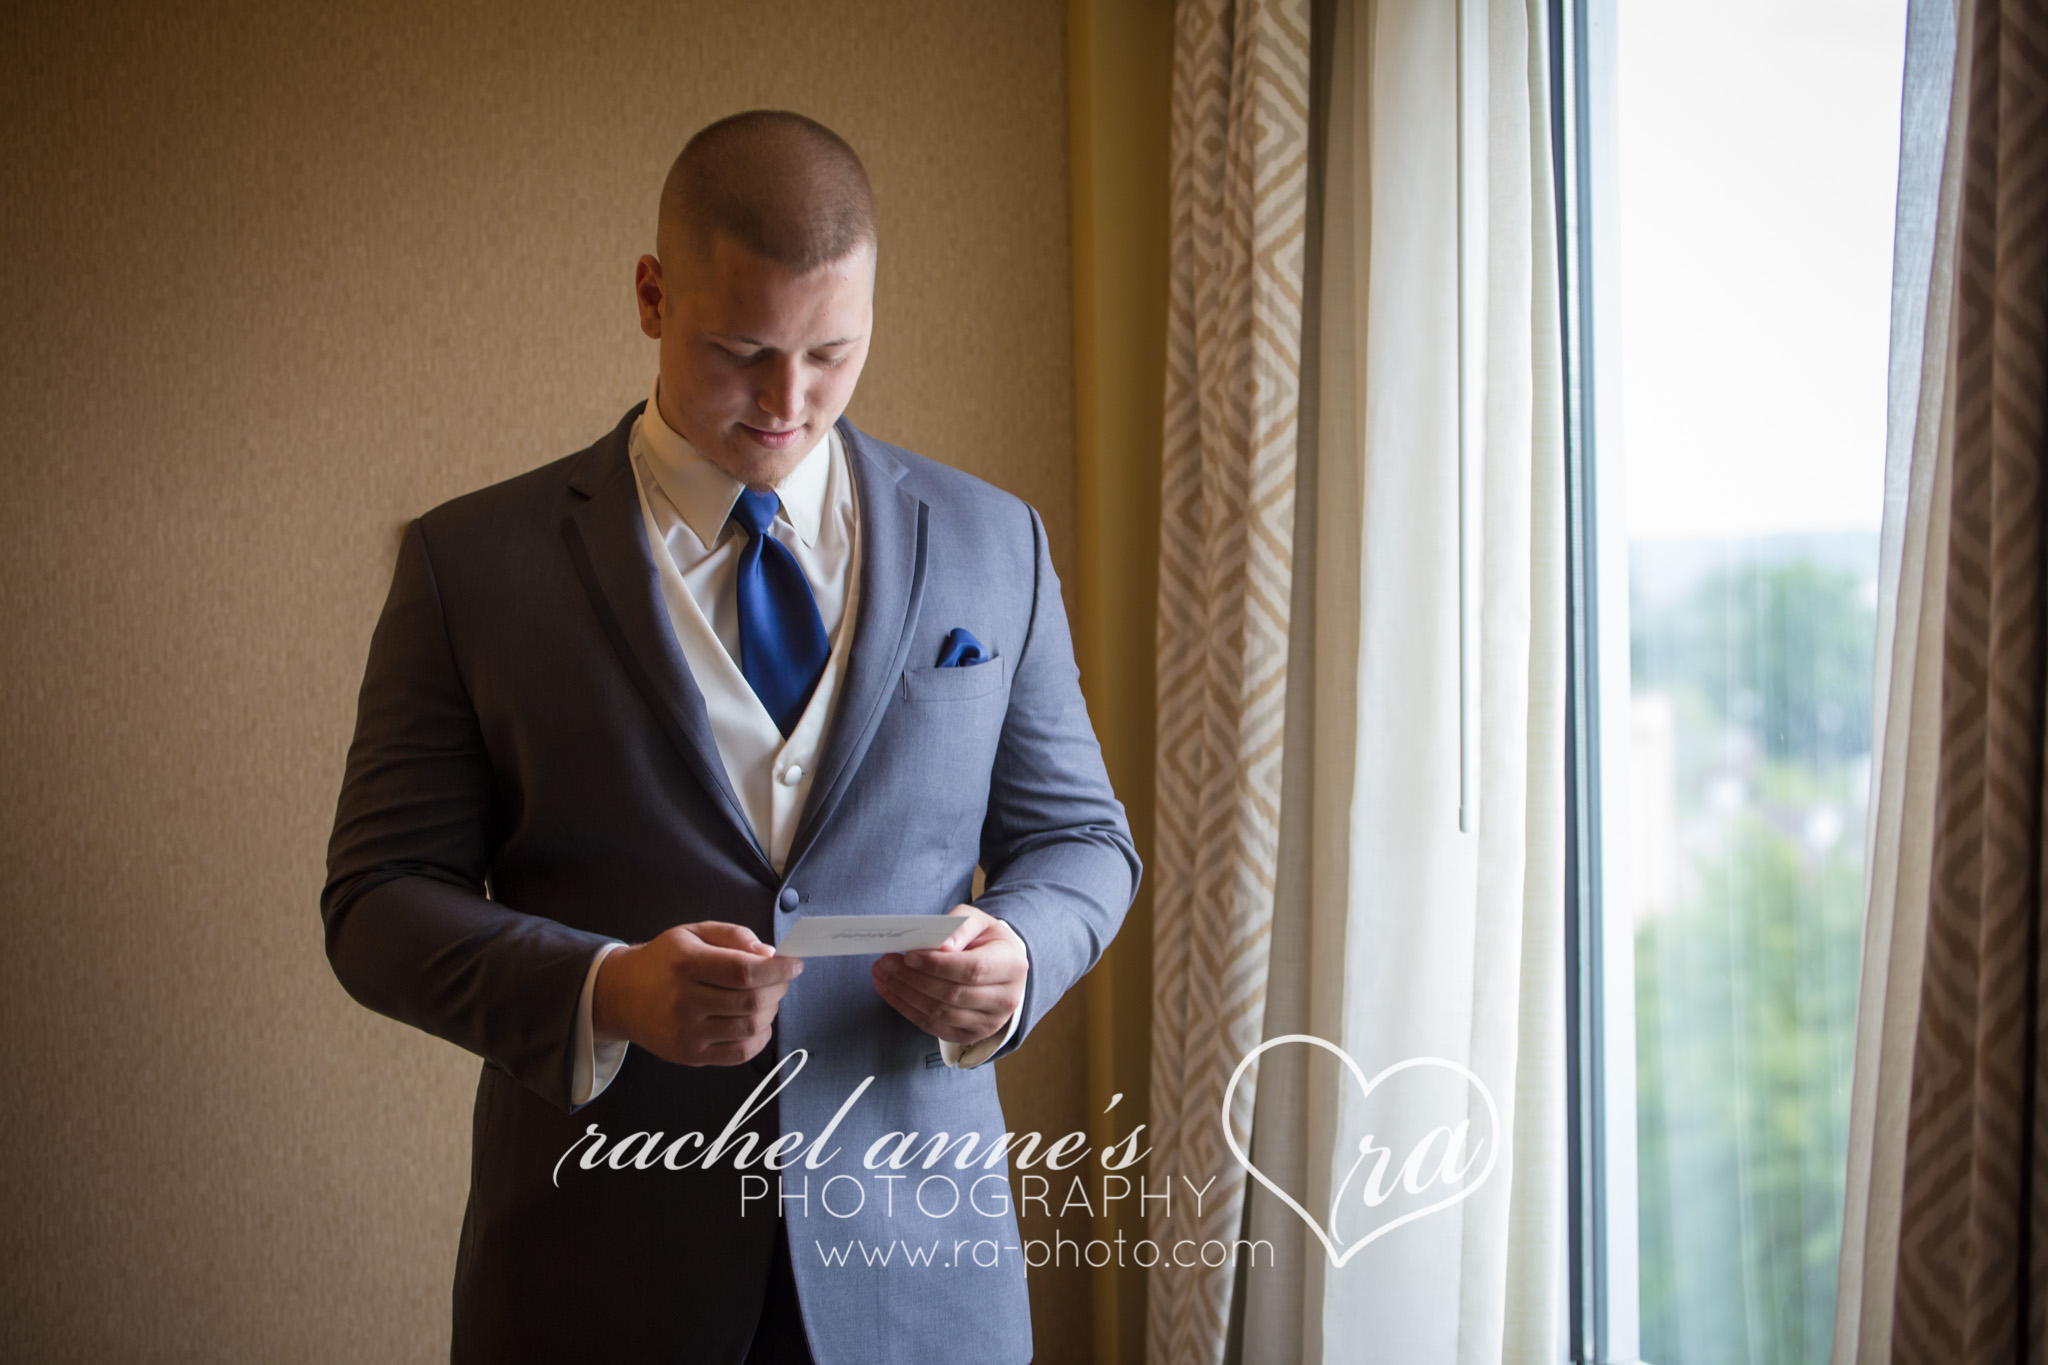 013-JCM-OLD-ECONOMY-VILLAGE-THE-FEZ-PA-WEDDINGS.jpg